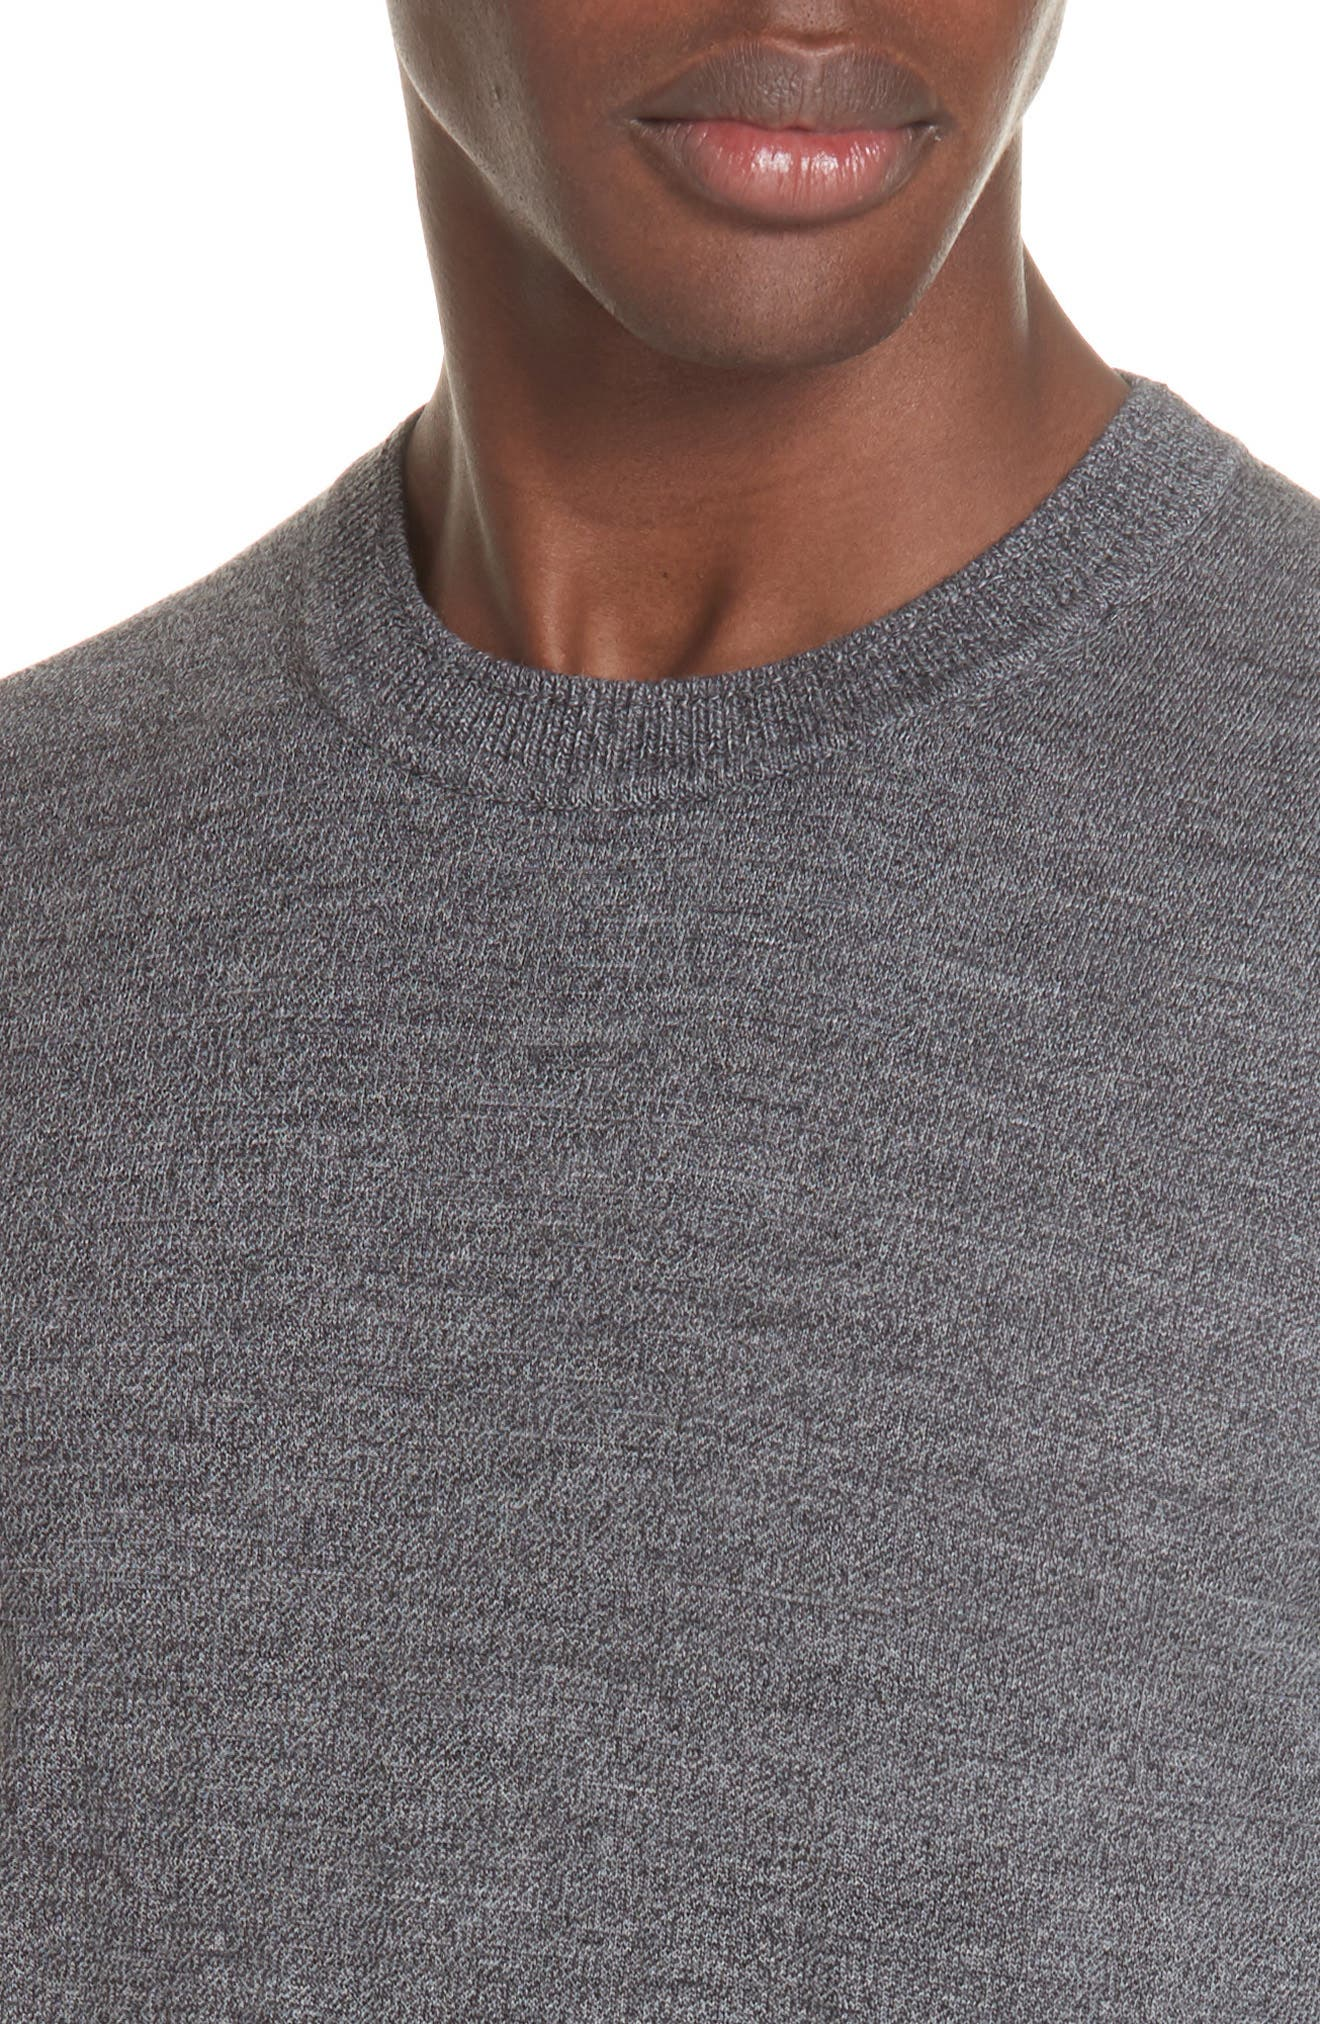 Merino Wool Sweater,                             Alternate thumbnail 4, color,                             028